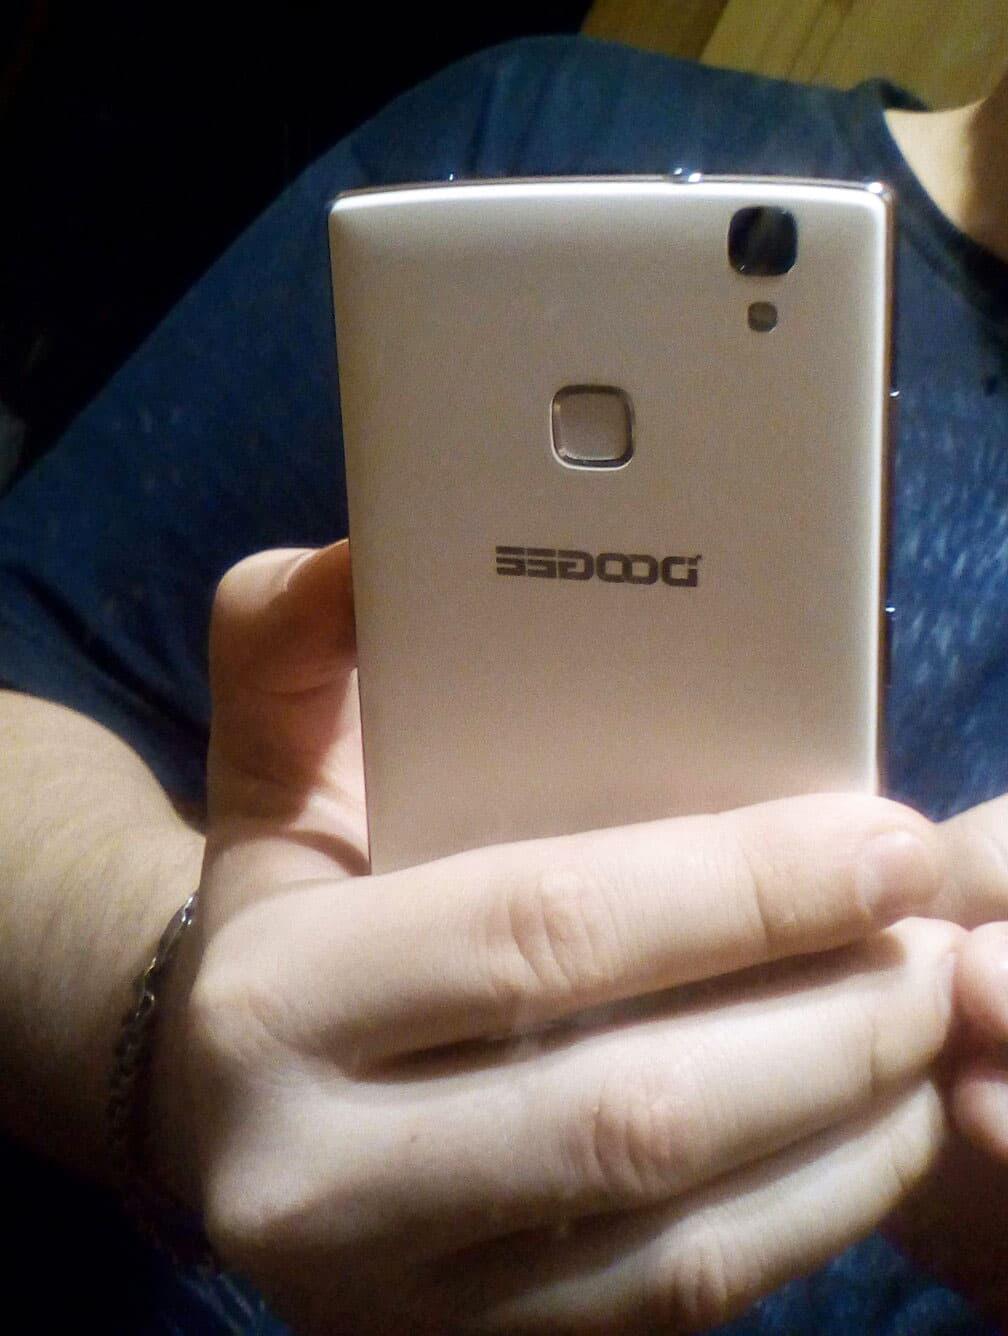 (17.12.2016 blogger) Обзор на DOOGEE X5 Max Pro - Бюджетный смартфон на Android 6.0 до 5000 рублей